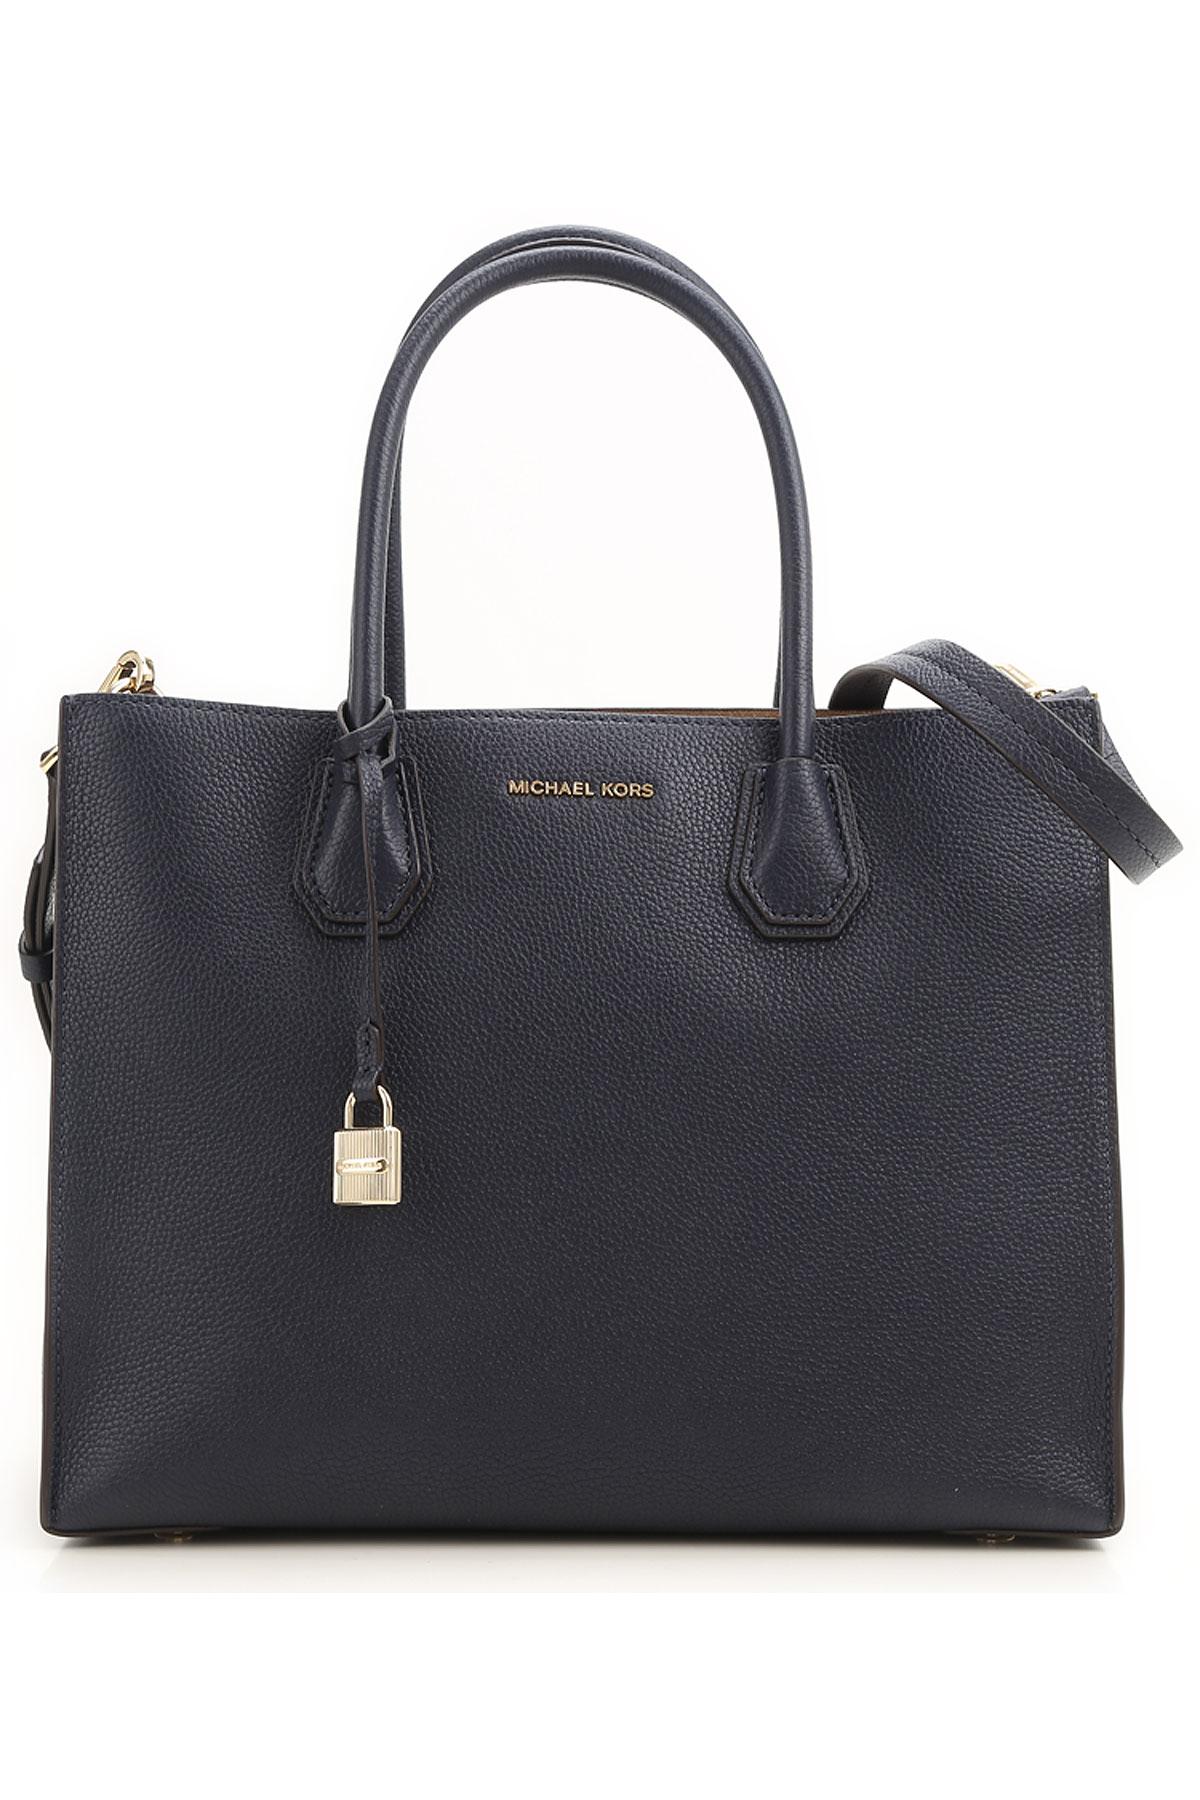 Michael Kors Top Handle Handbag, Admiral Blue, Leather, 2019